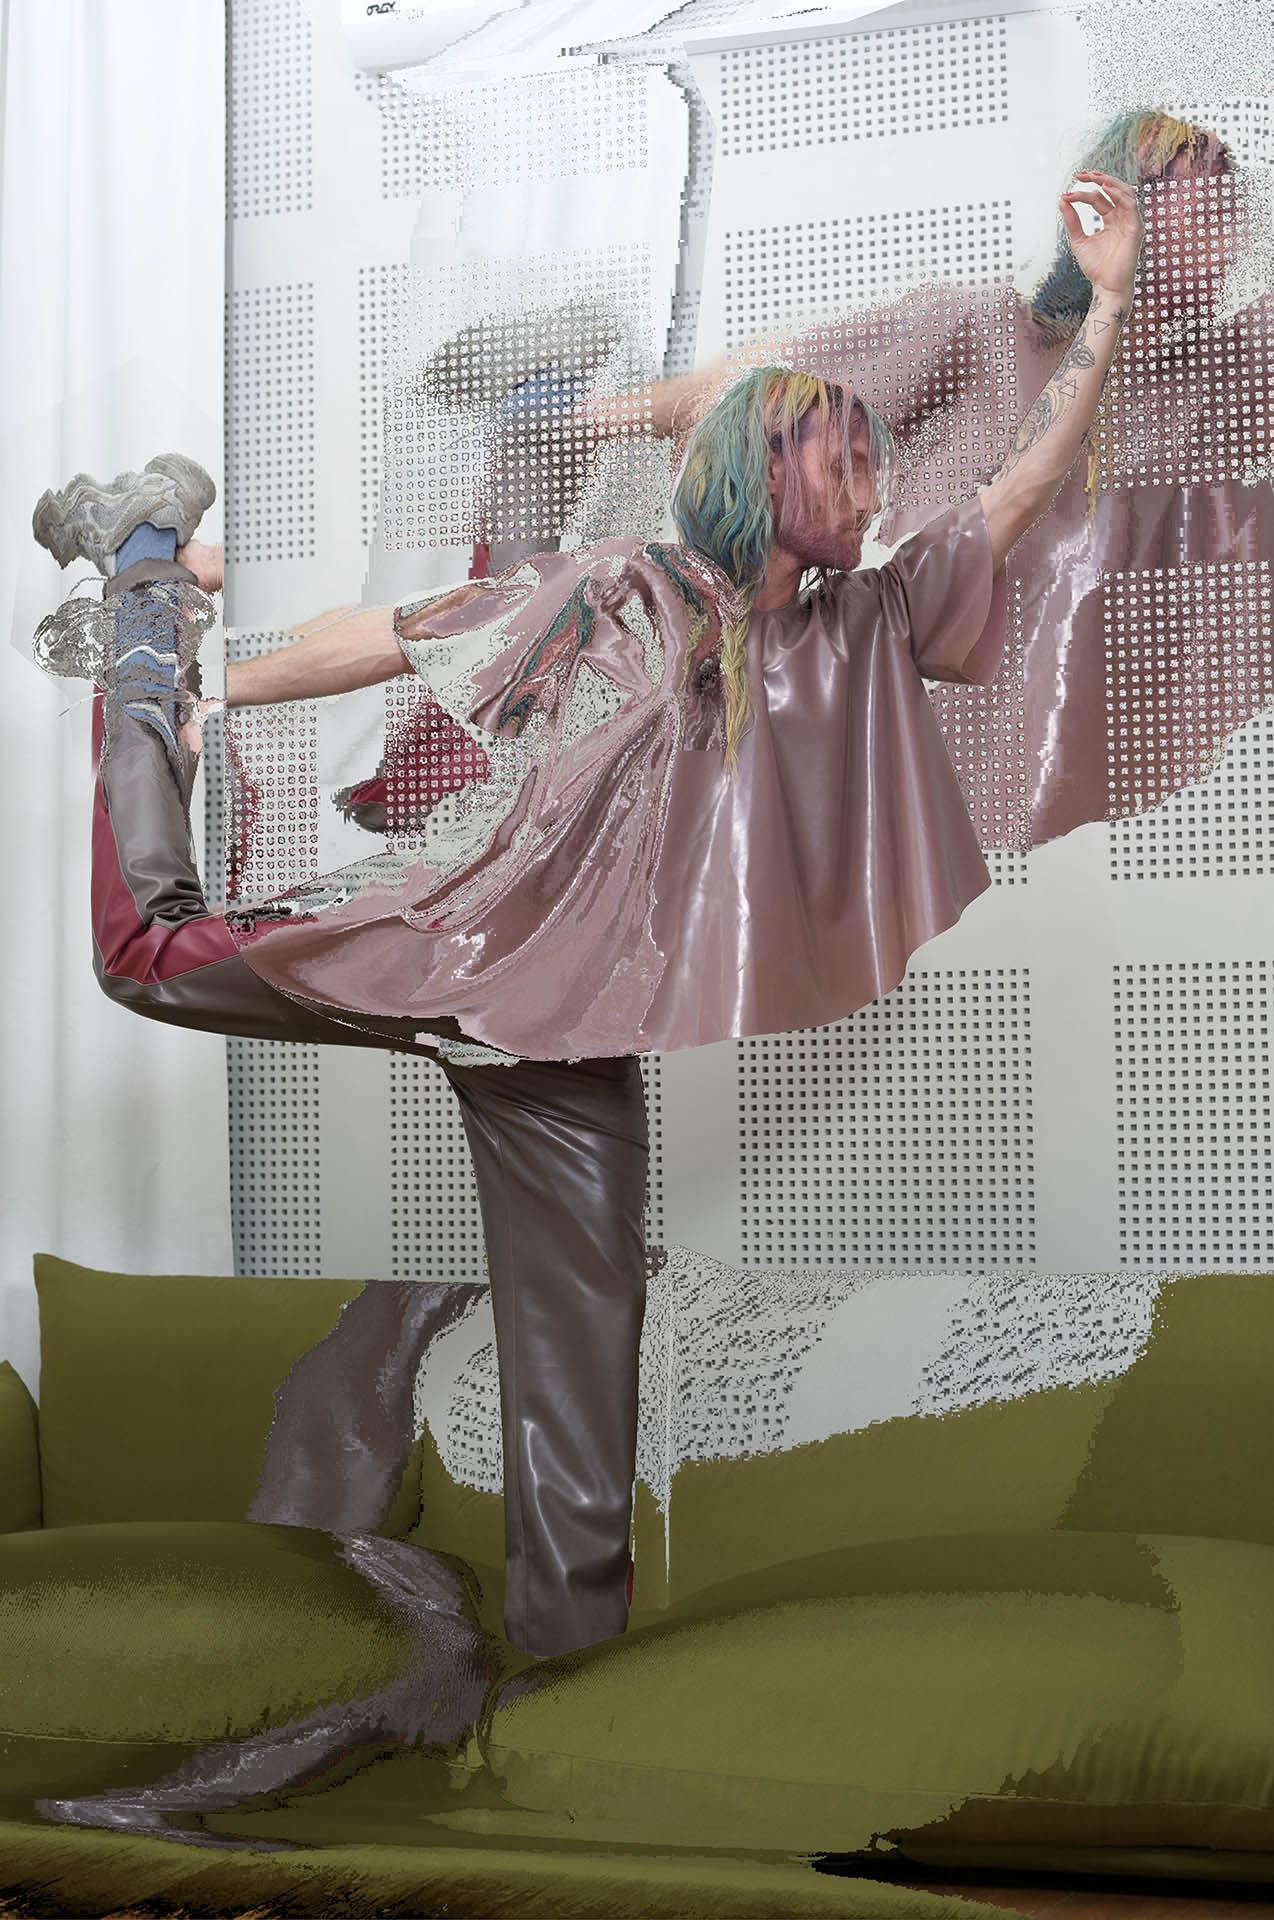 Photo of a women for Apart Publication, by Perimetre creative studio based in Paris